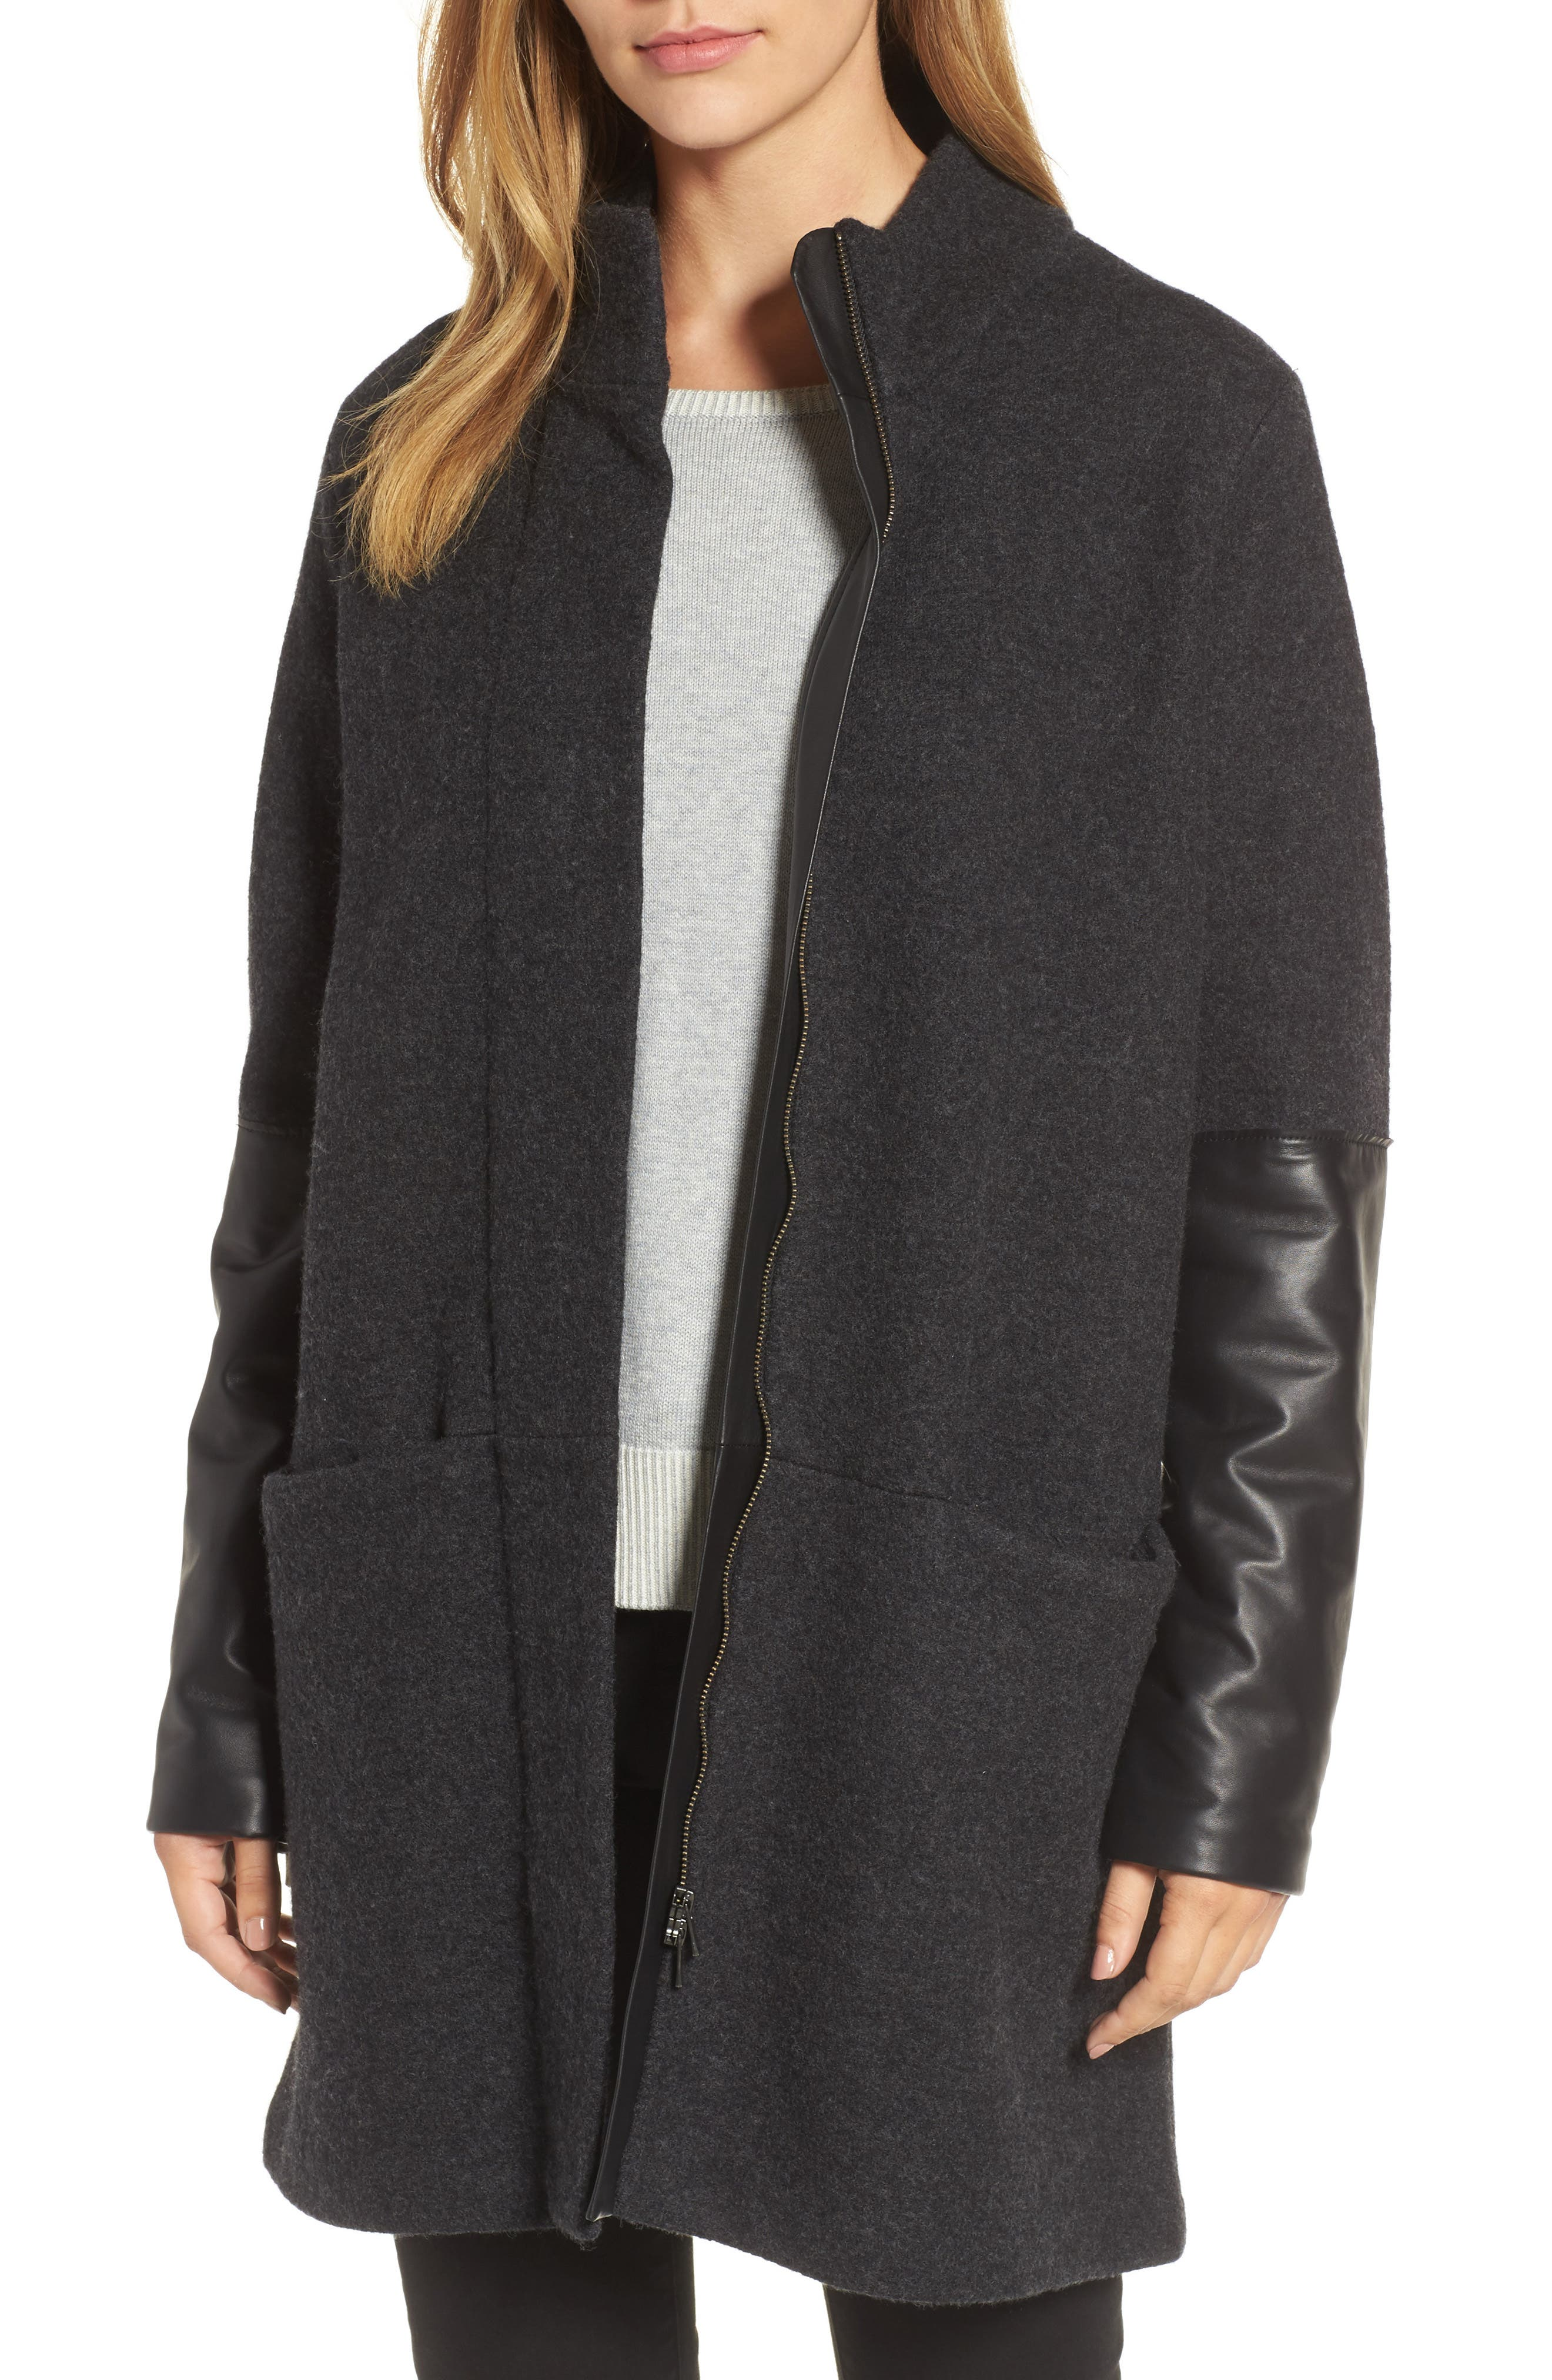 Eileen Fisher Leather Sleeve Wool Jacket